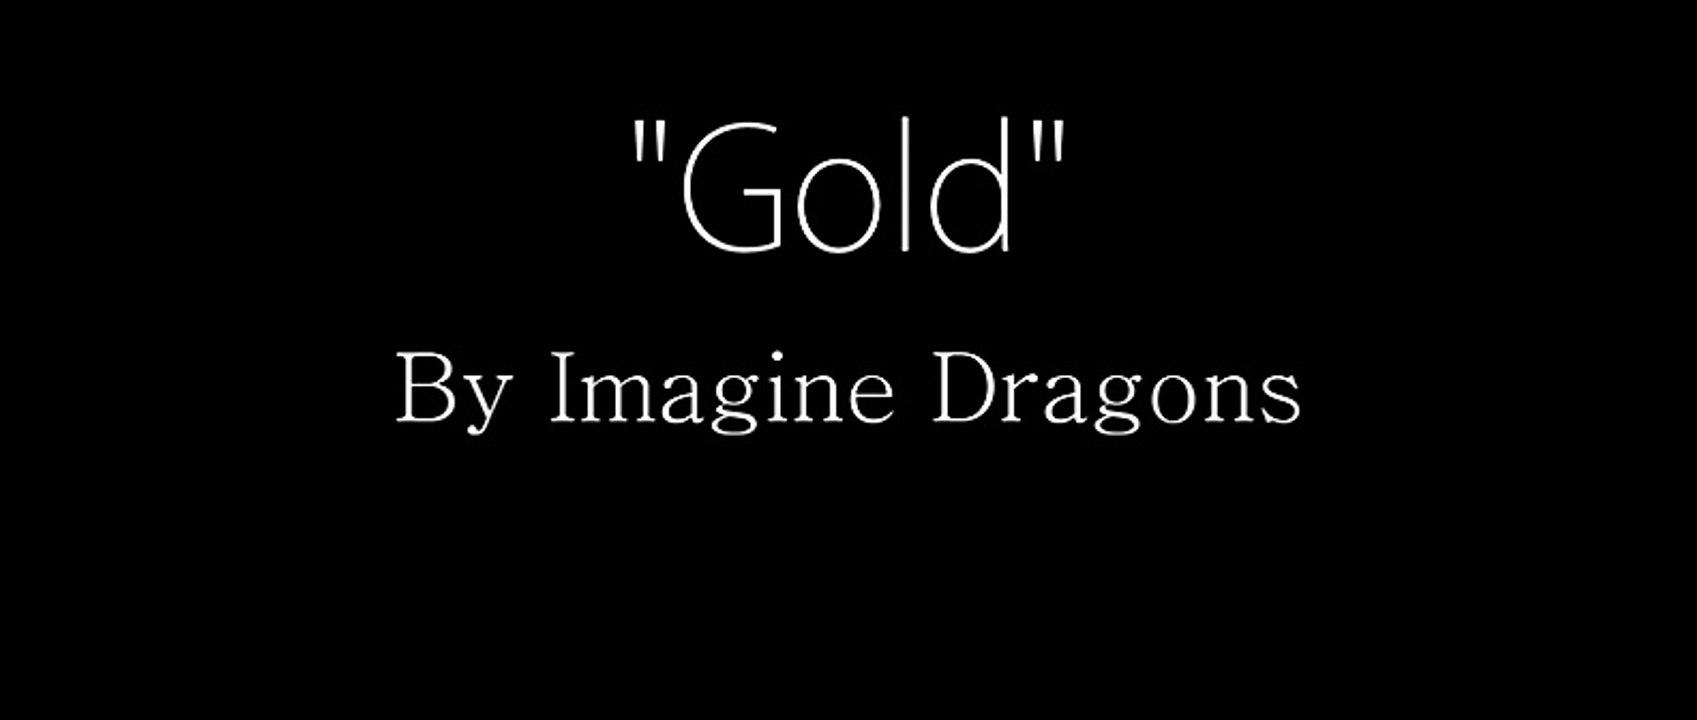 Imagine dragons gold lyrics video organon pharmaceuticals address